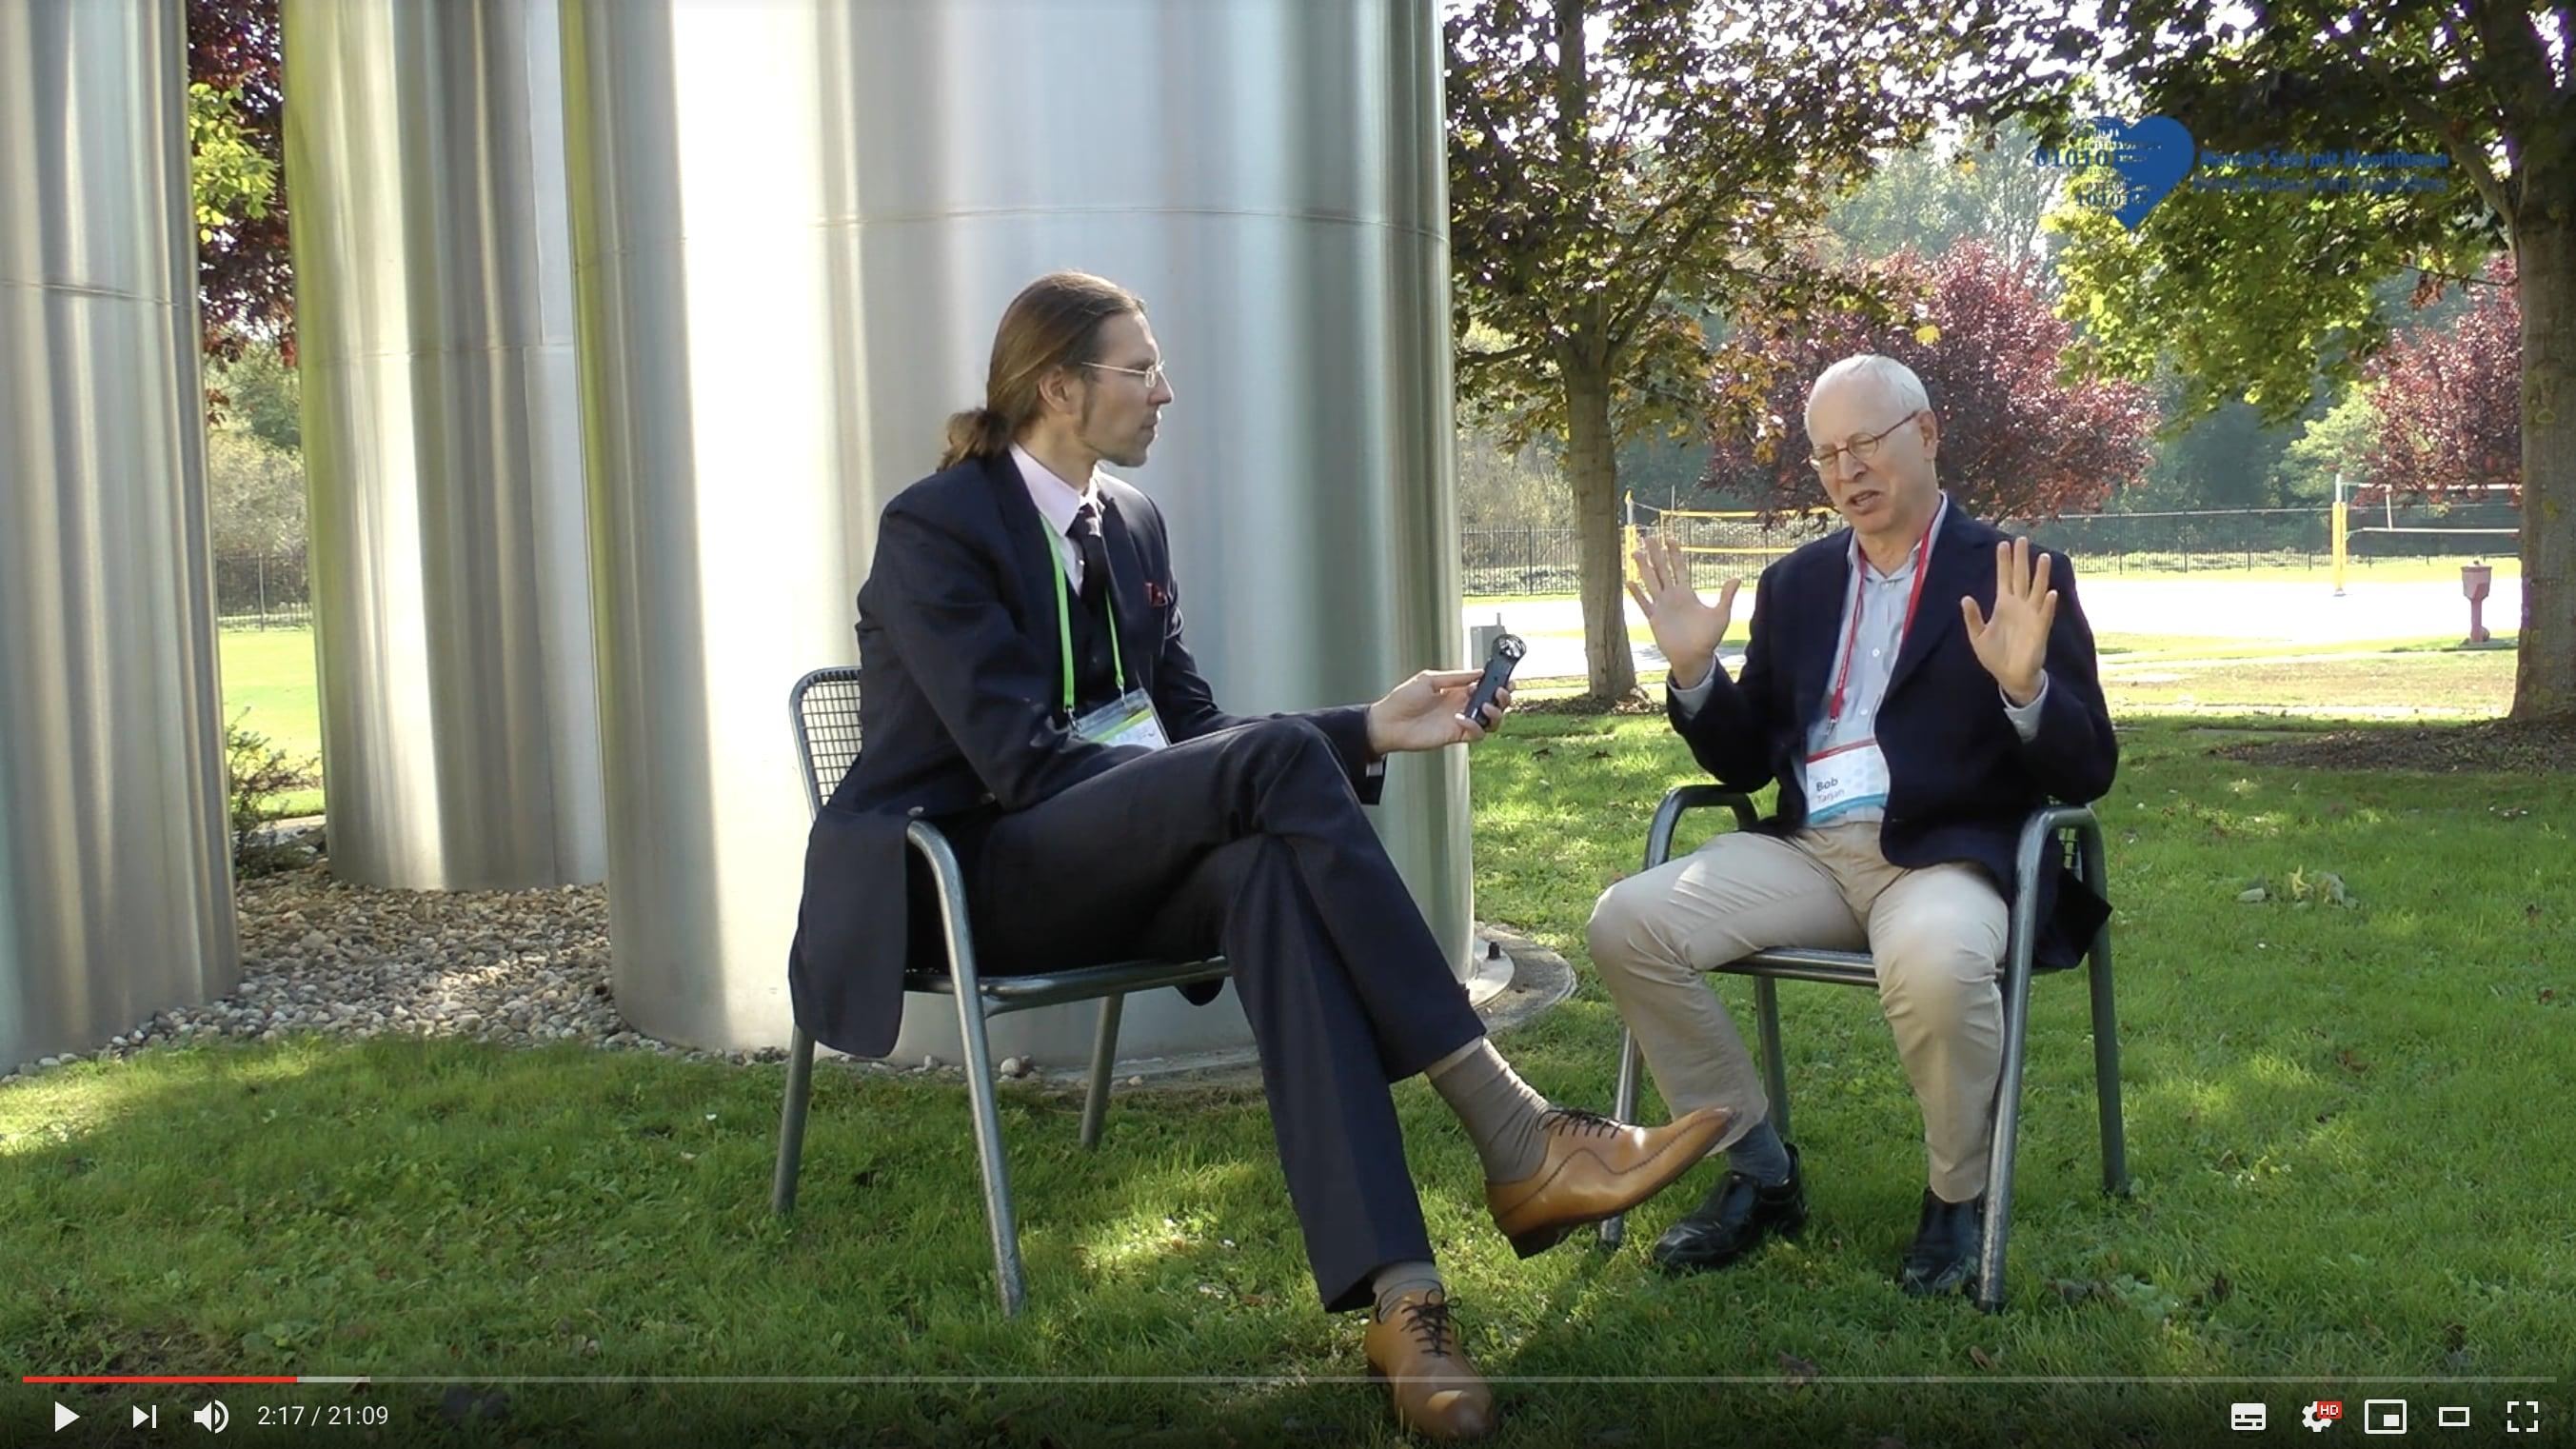 Matc-Oliver Pahl and Robert Tarjan